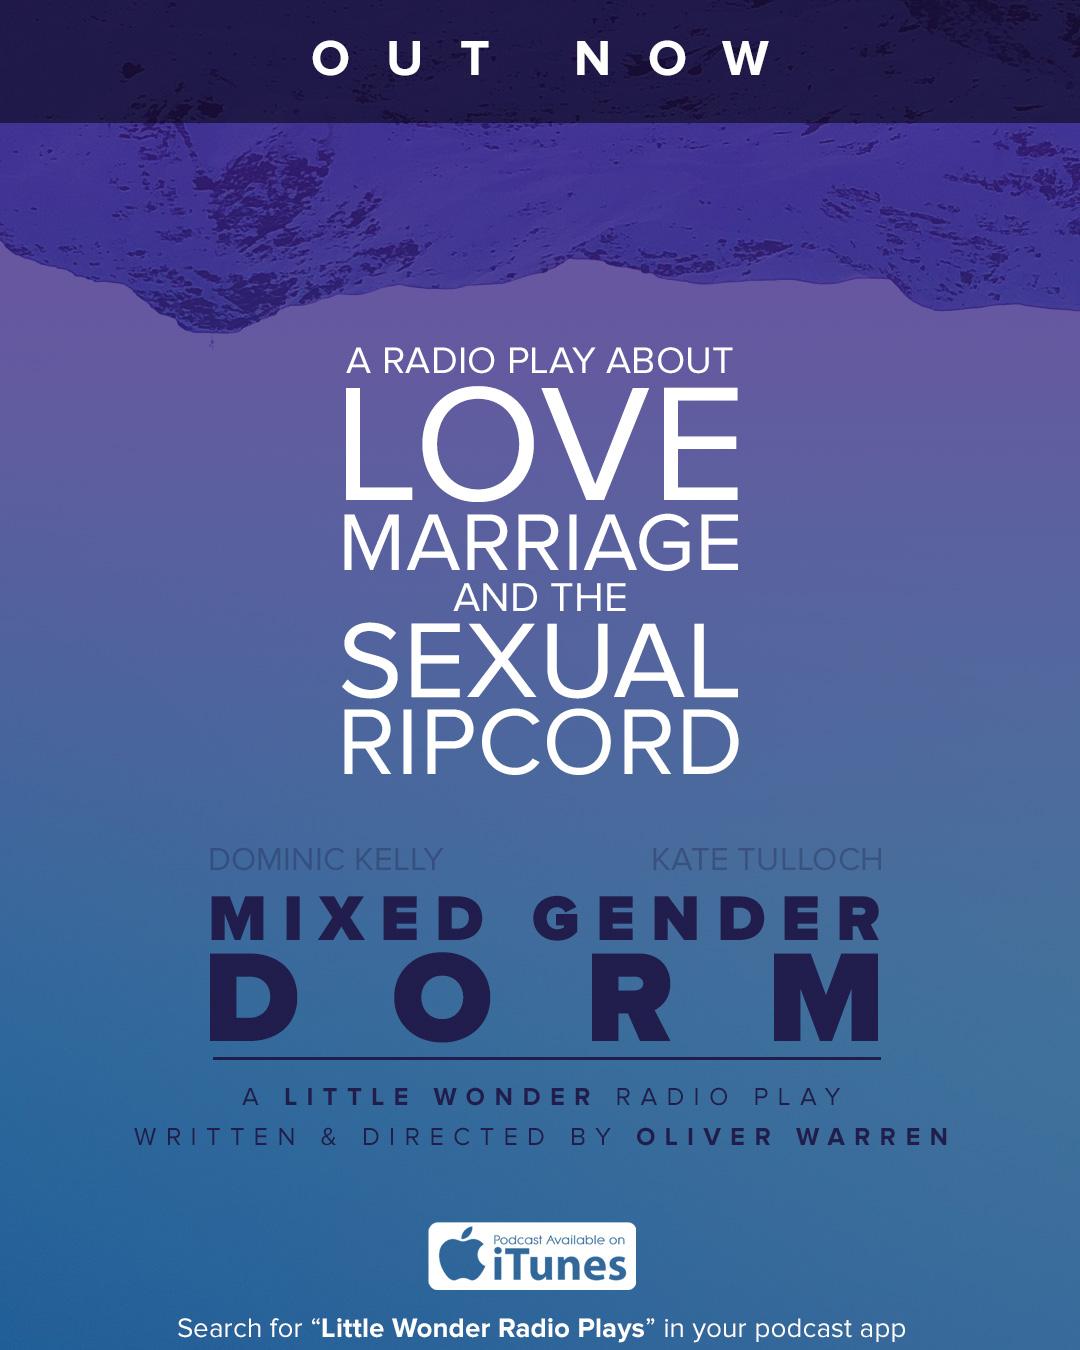 mixedgenderdorm_instapost_A.jpg